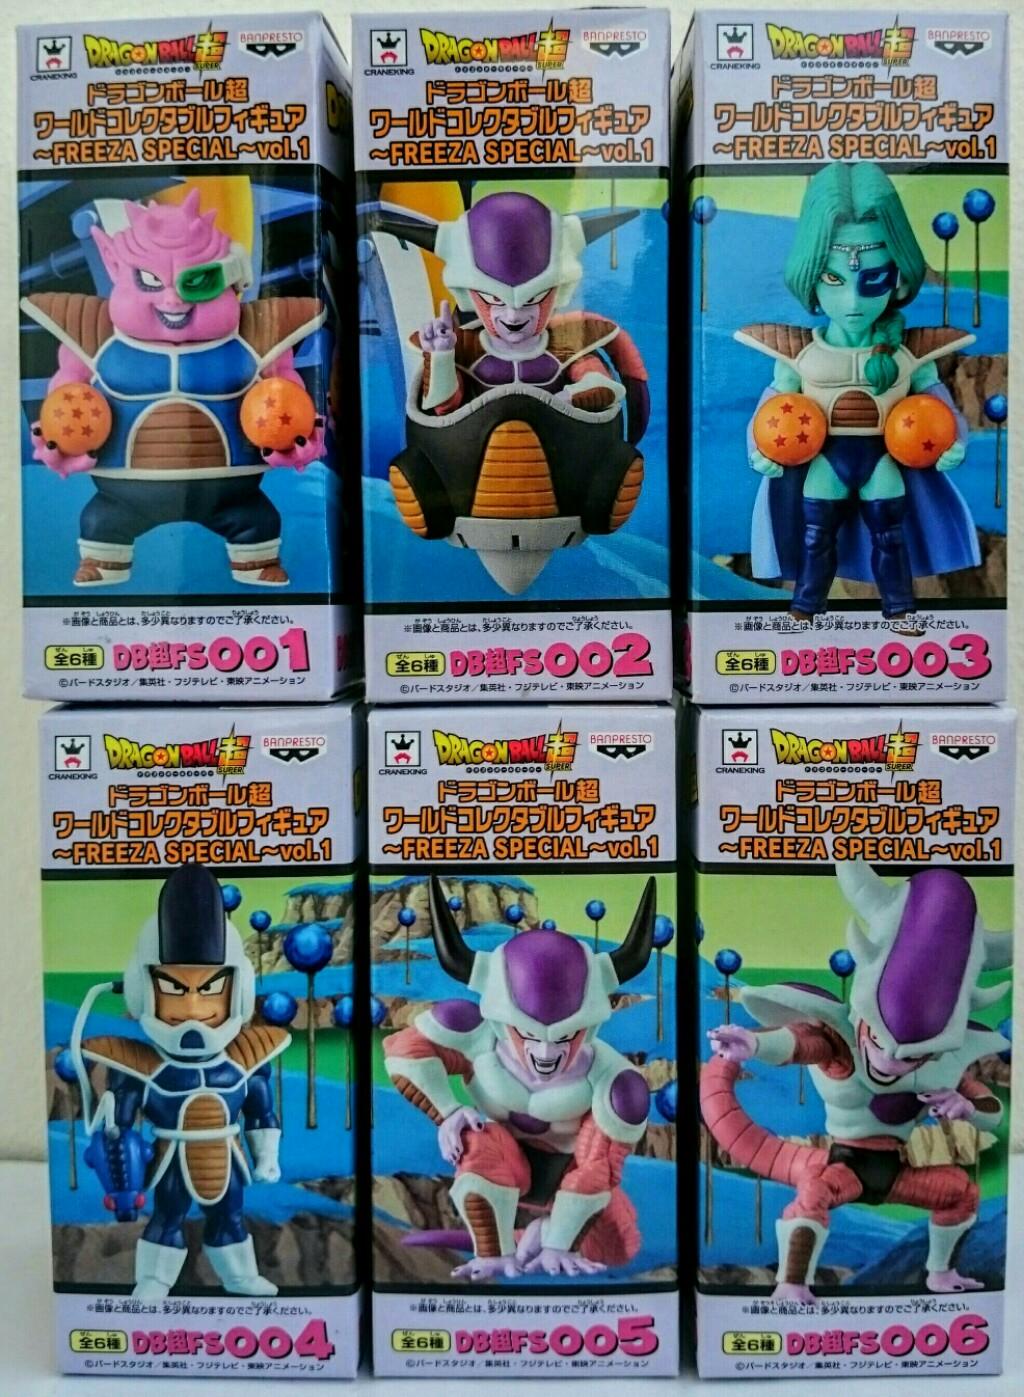 WCF Dragonball Freeza Special Vol.1 ครบชุด 6 ตัว